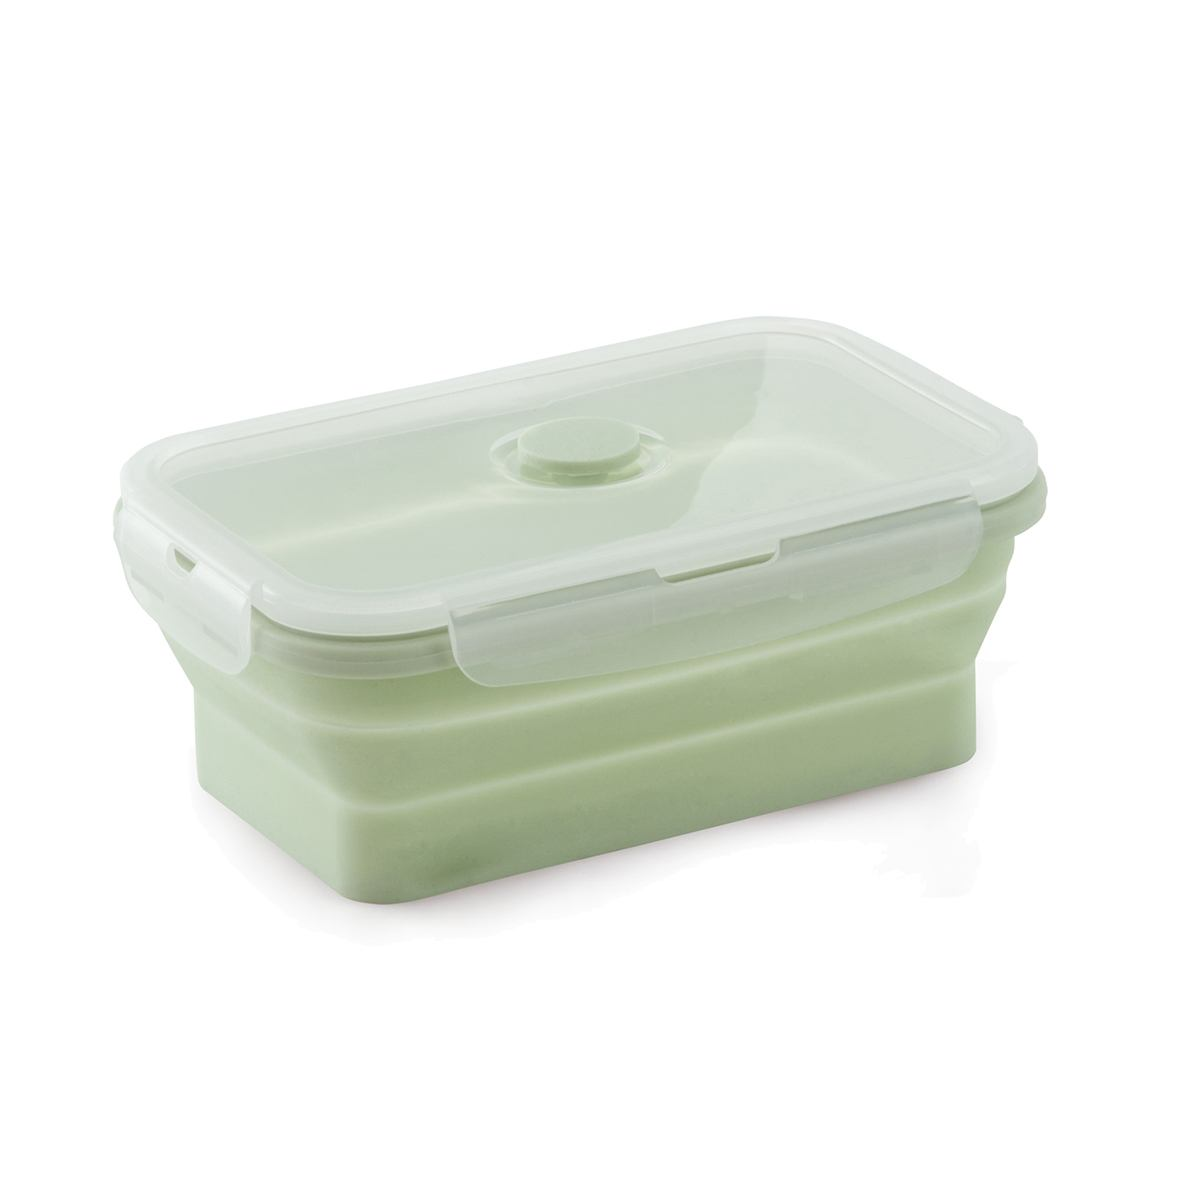 Marmita porta alimentos silicone retrátil 700ml  verde Mimo Style